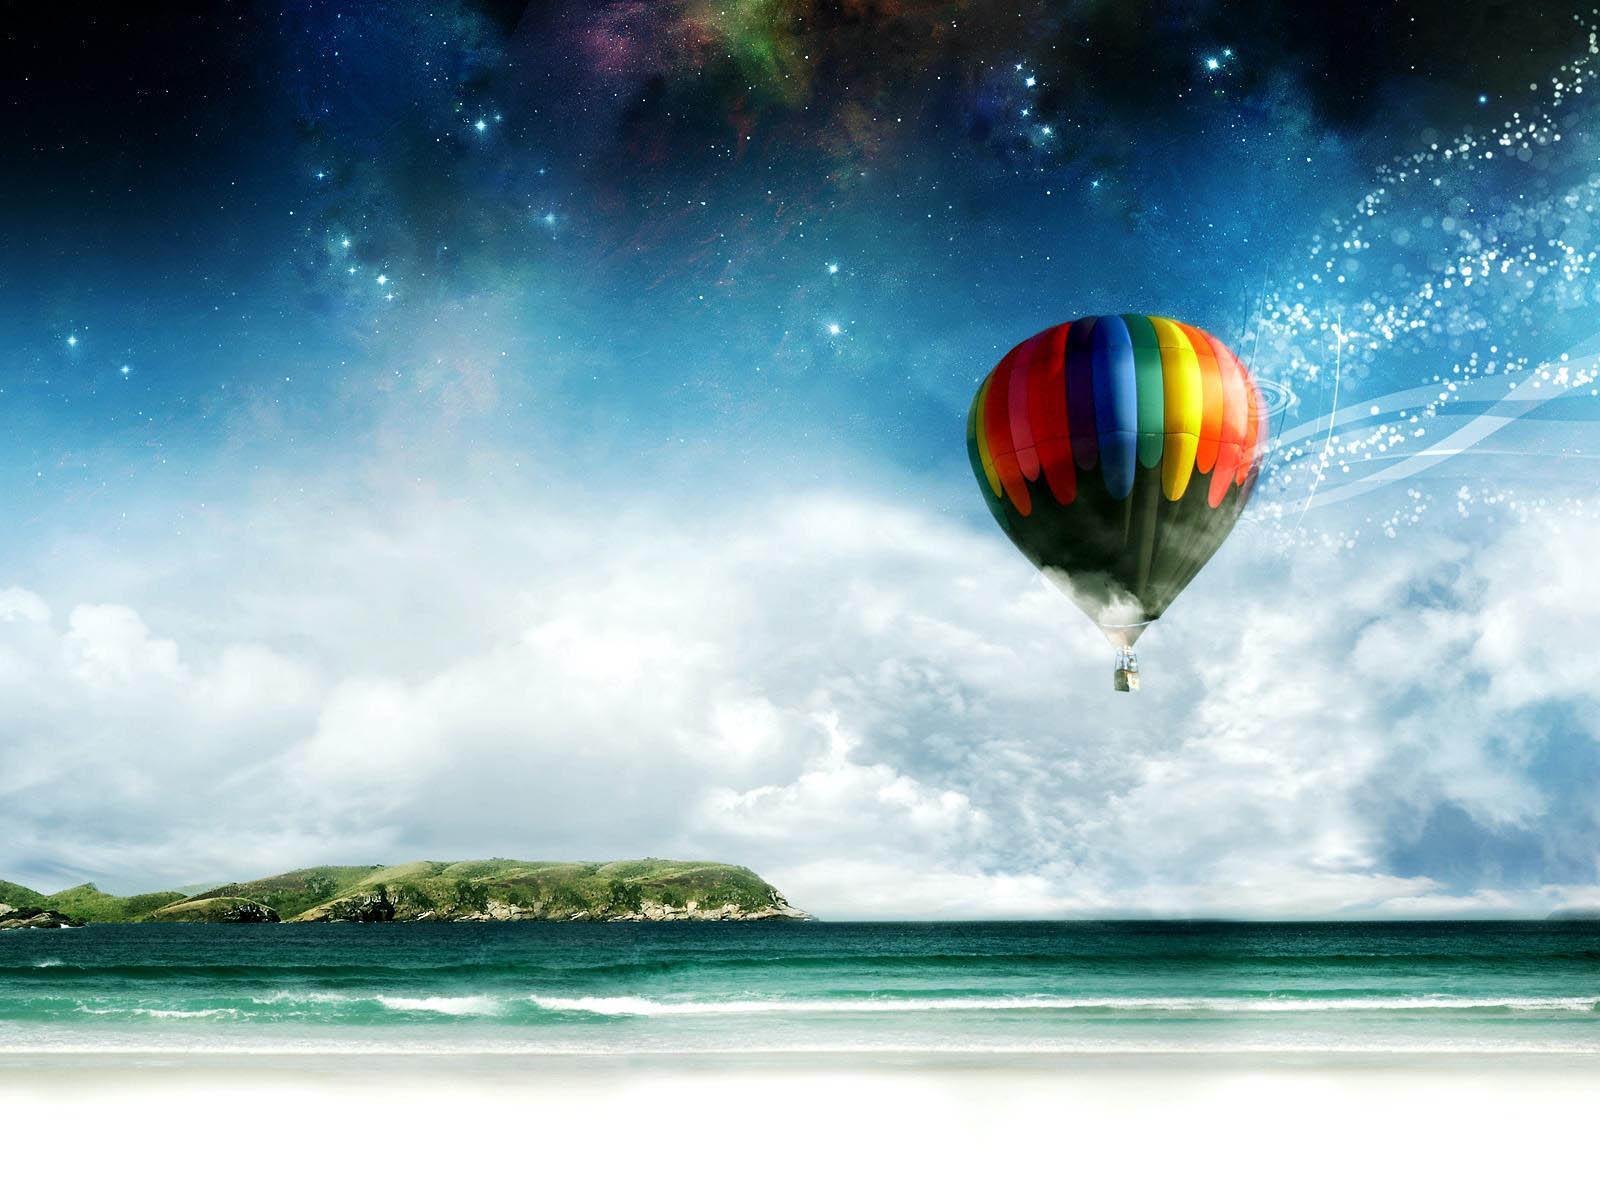 Gambar Gambar Balon Udara Yang Cantik